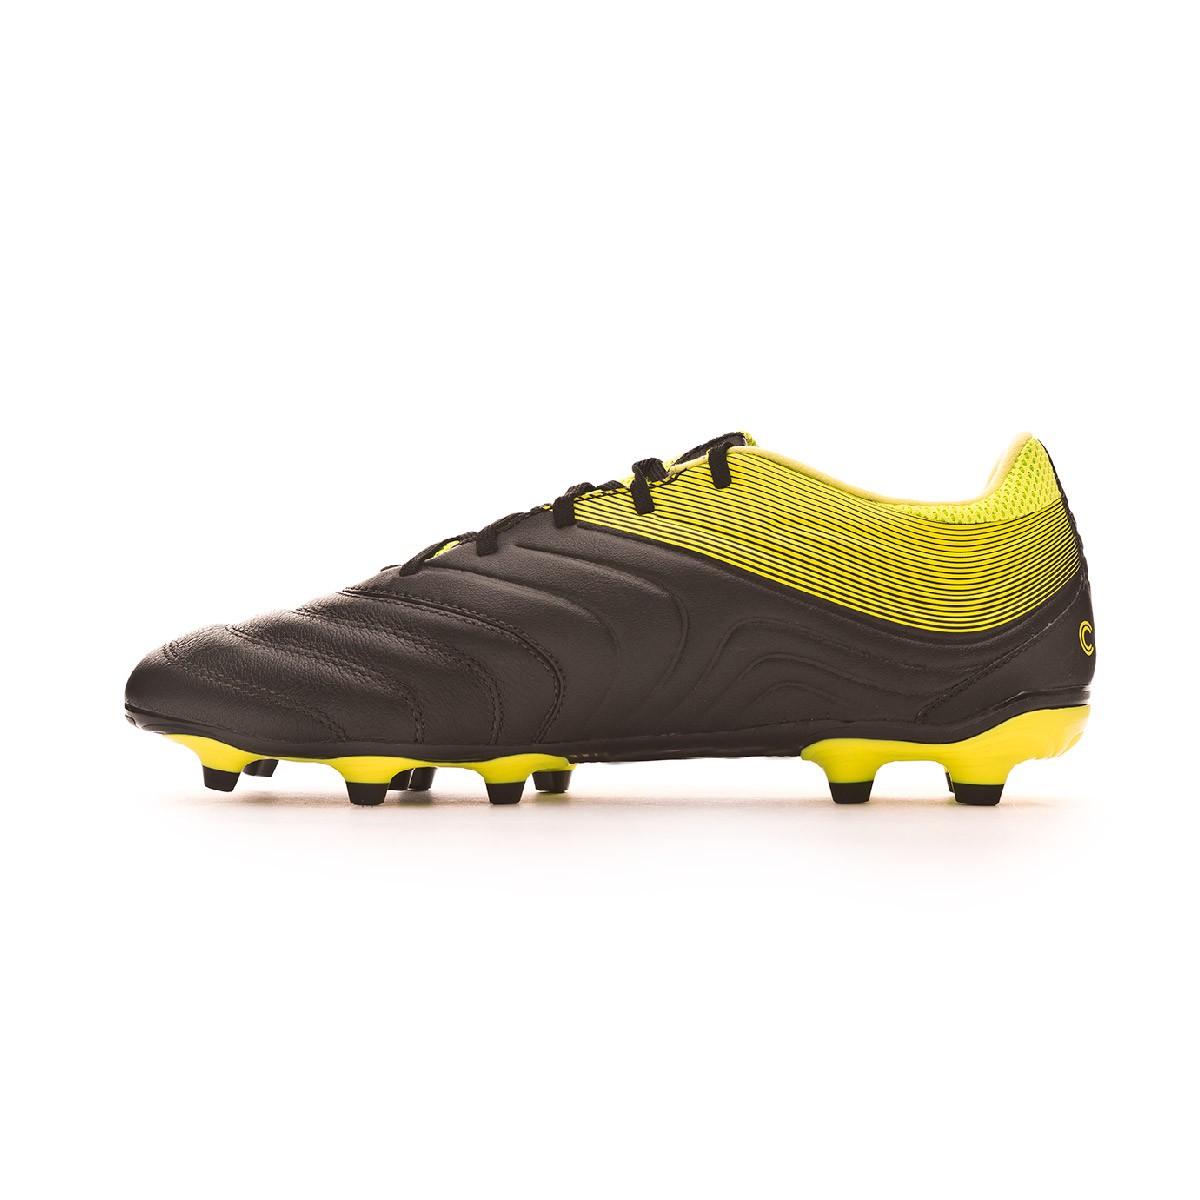 b40e0b6b6ccd6 Bota de fútbol adidas Copa 19.3 FG Core black-Solar yellow-Core black -  Tienda de fútbol Fútbol Emotion